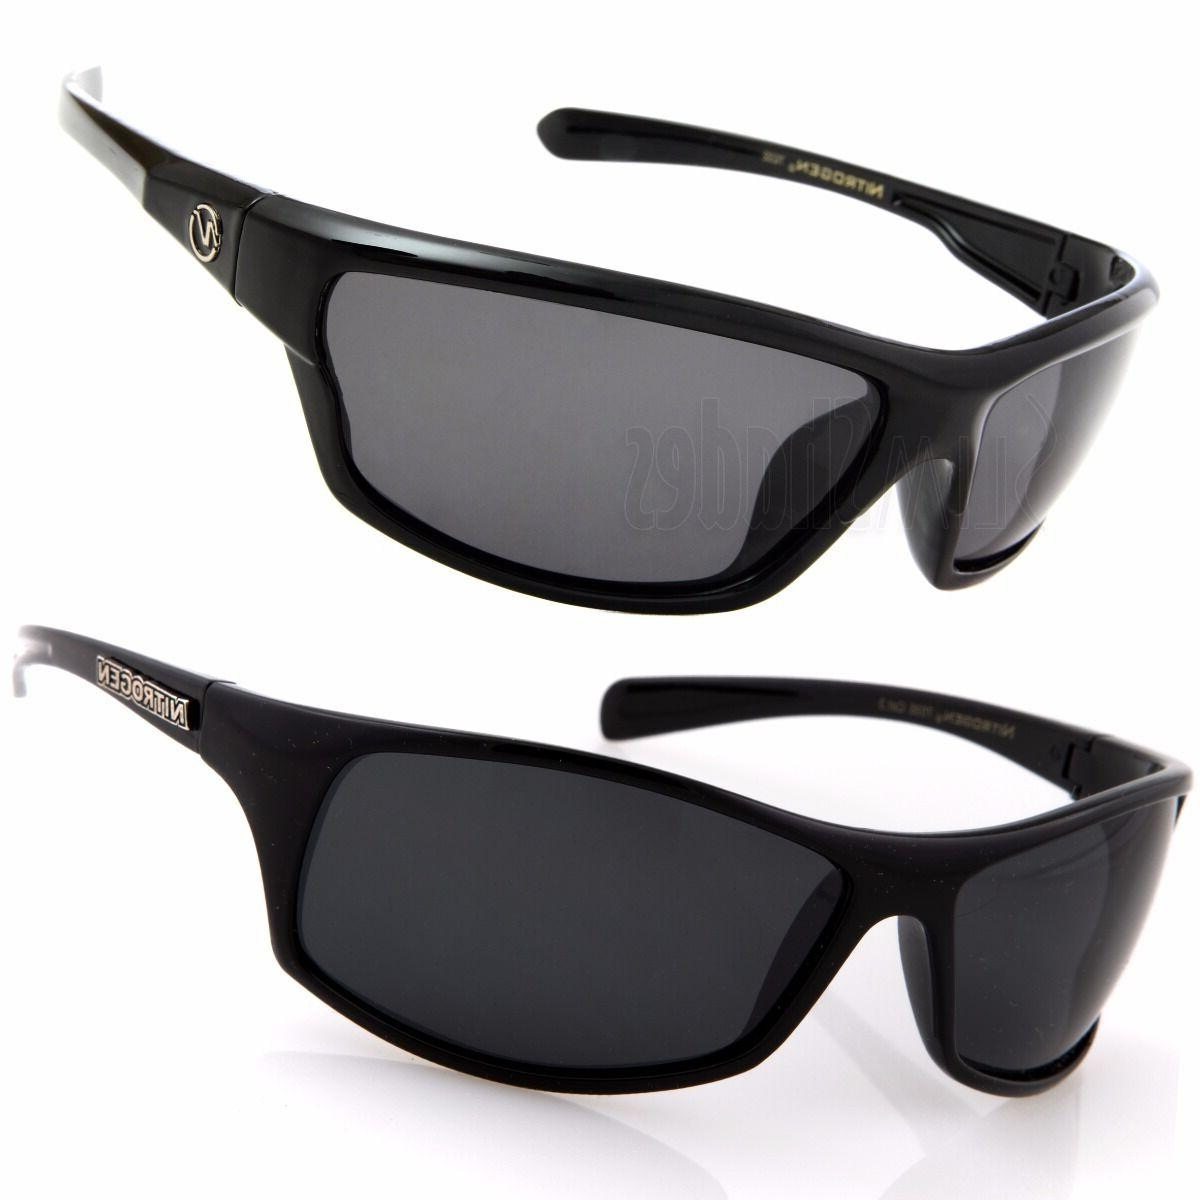 2 pair polarized sunglasses mens sport running